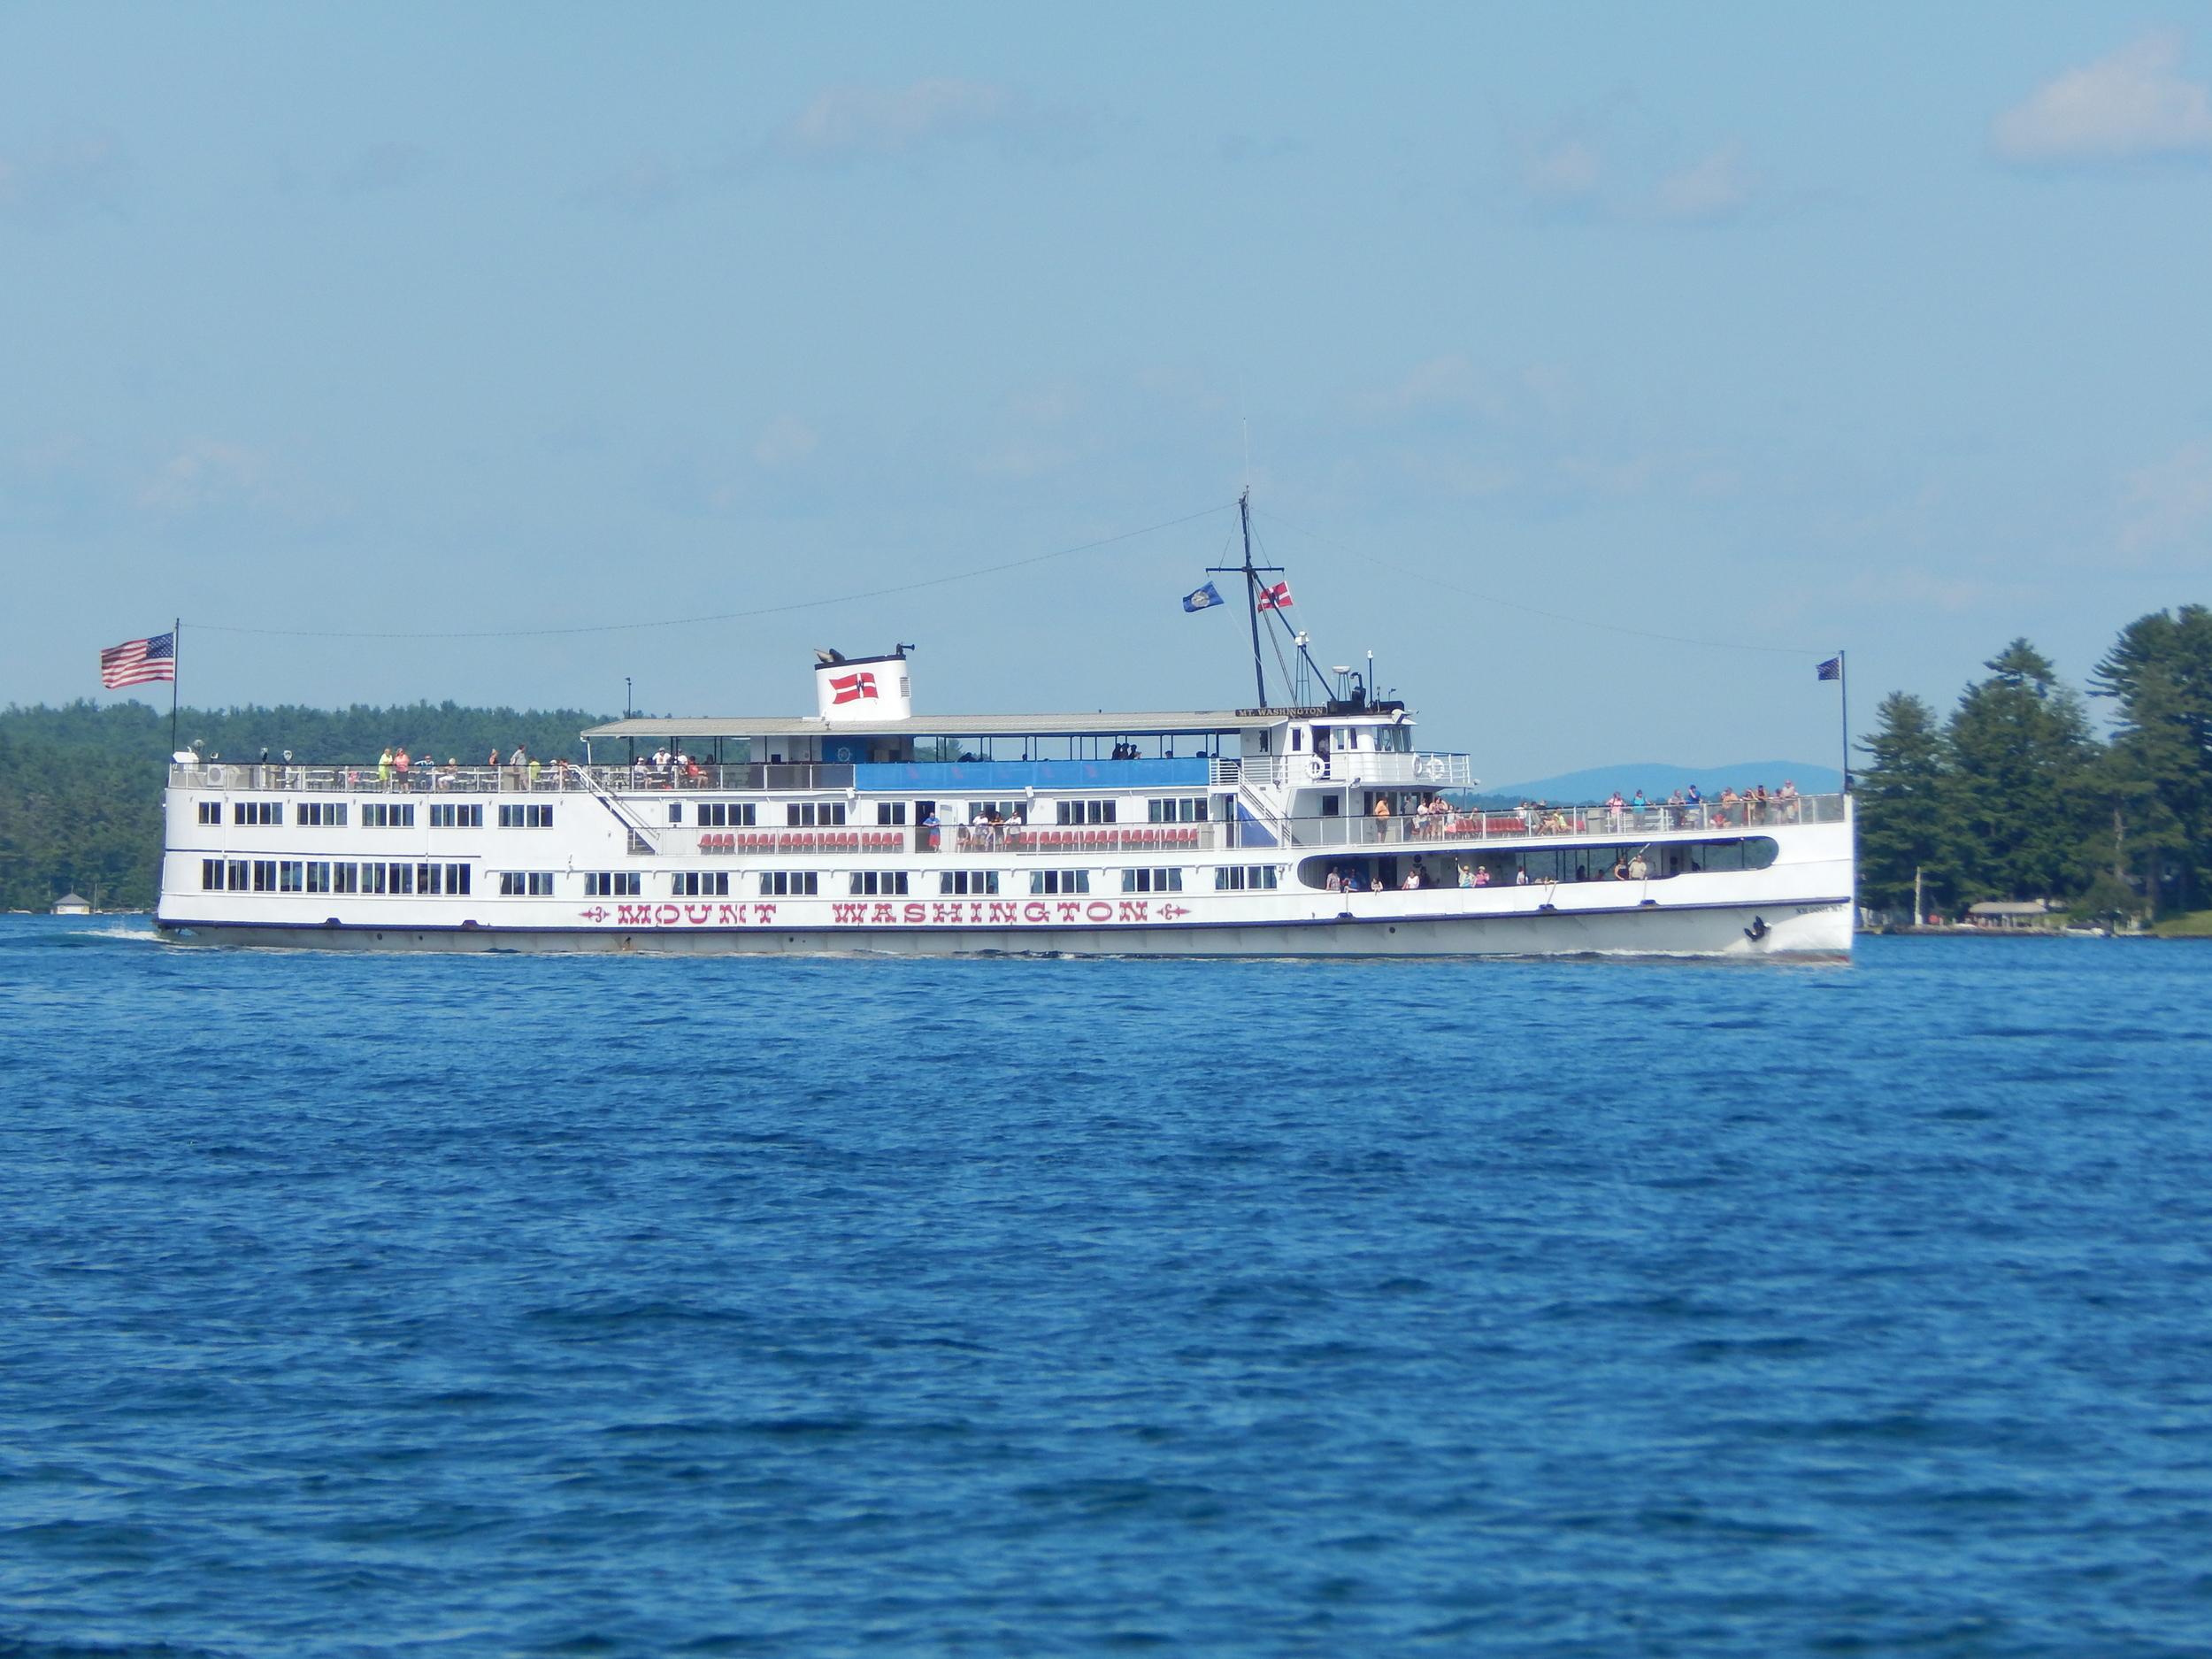 Cruise ships on the lake